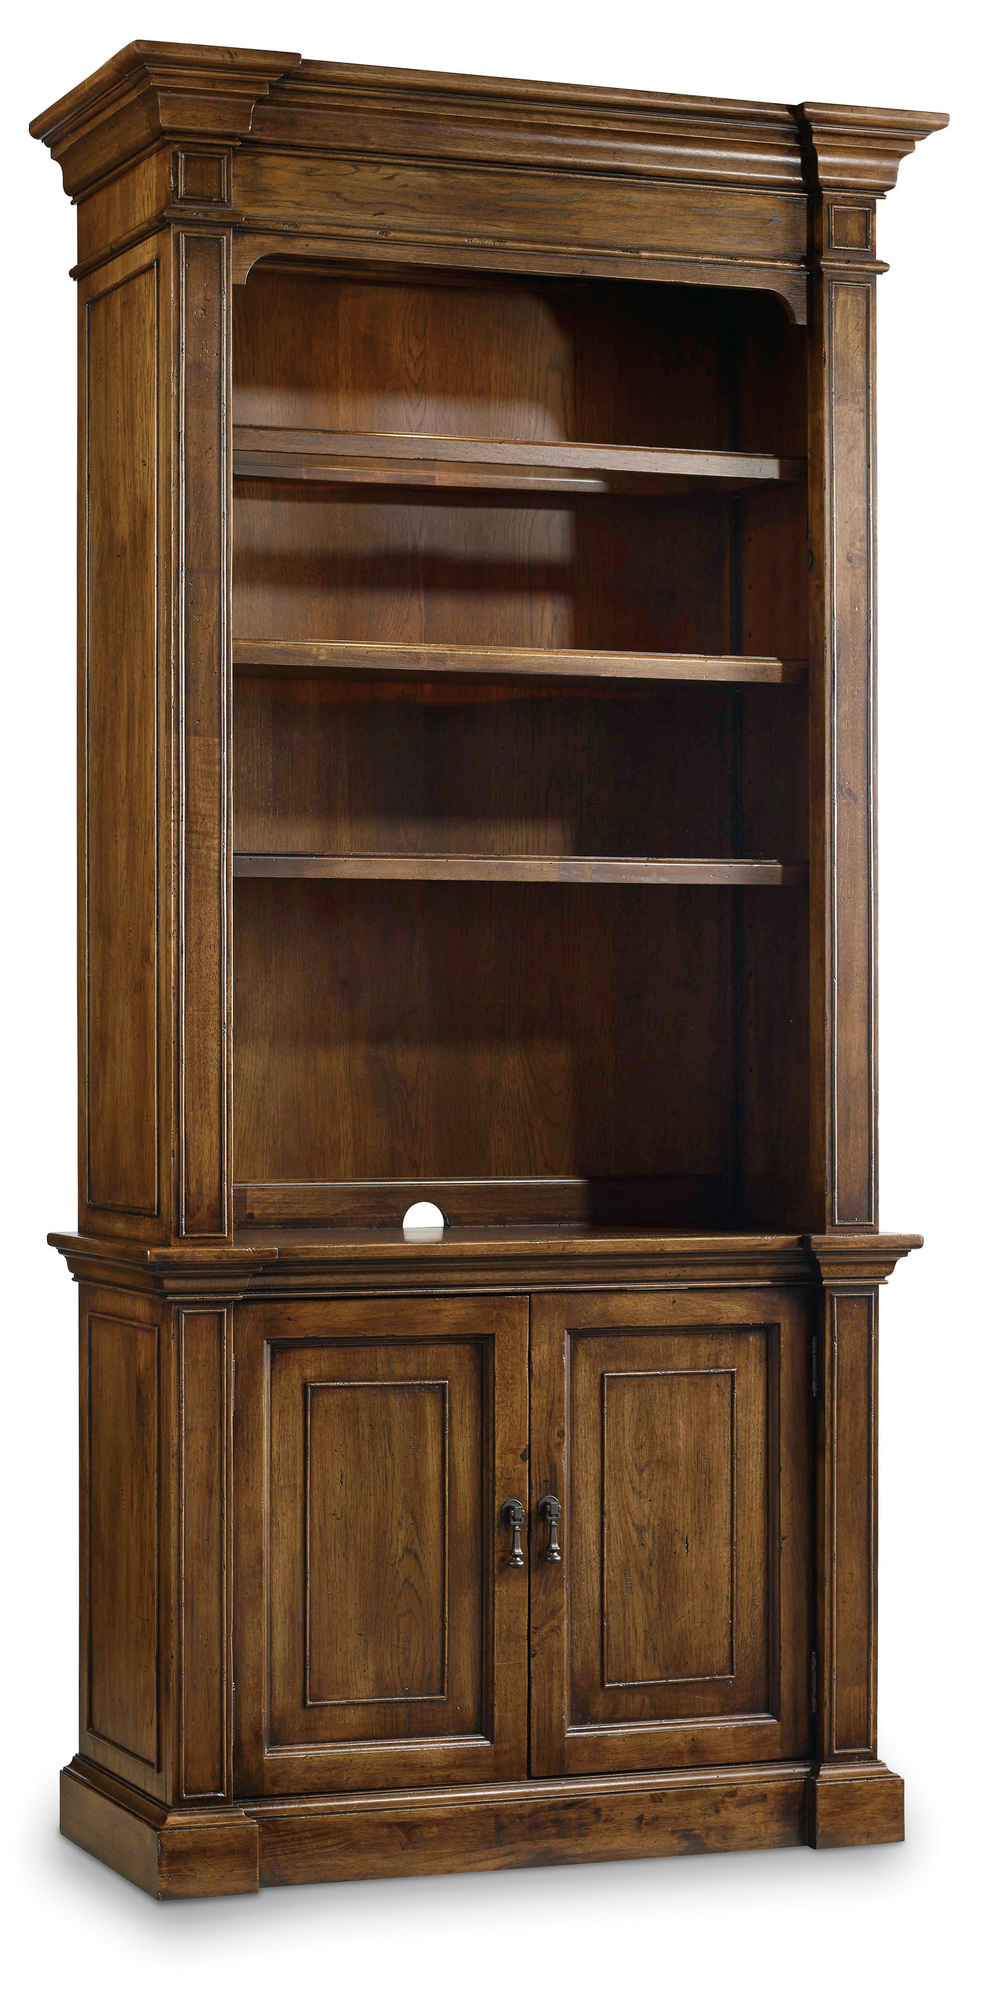 Hooker Furniture - Archivist Bookcase